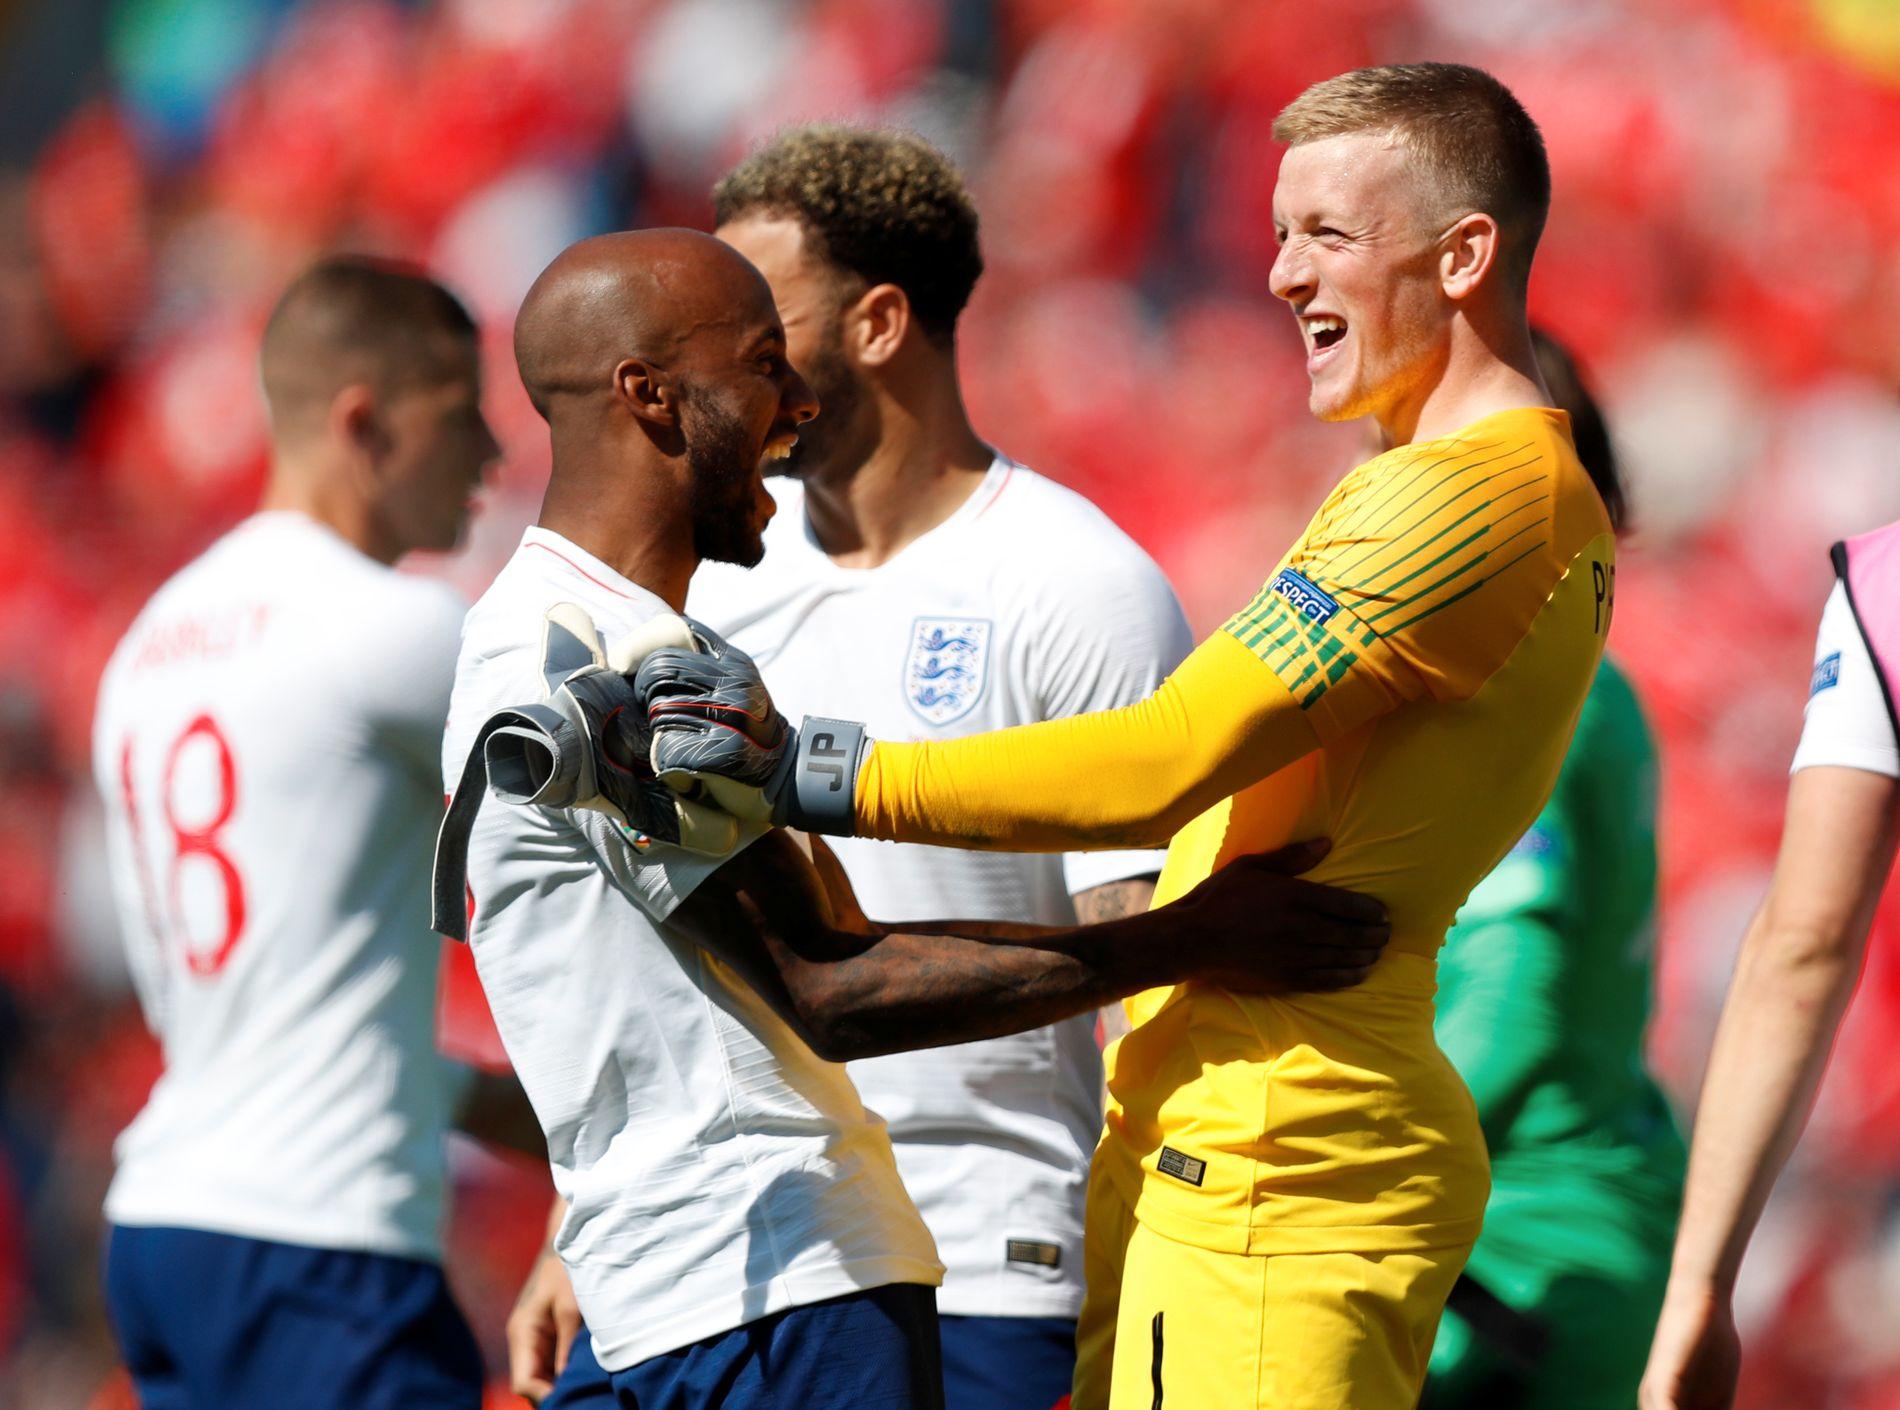 ENGLAND-HELT: Jordan Pickford både scoret og reddet straffe da England vant bronsefinalen i Nations League.